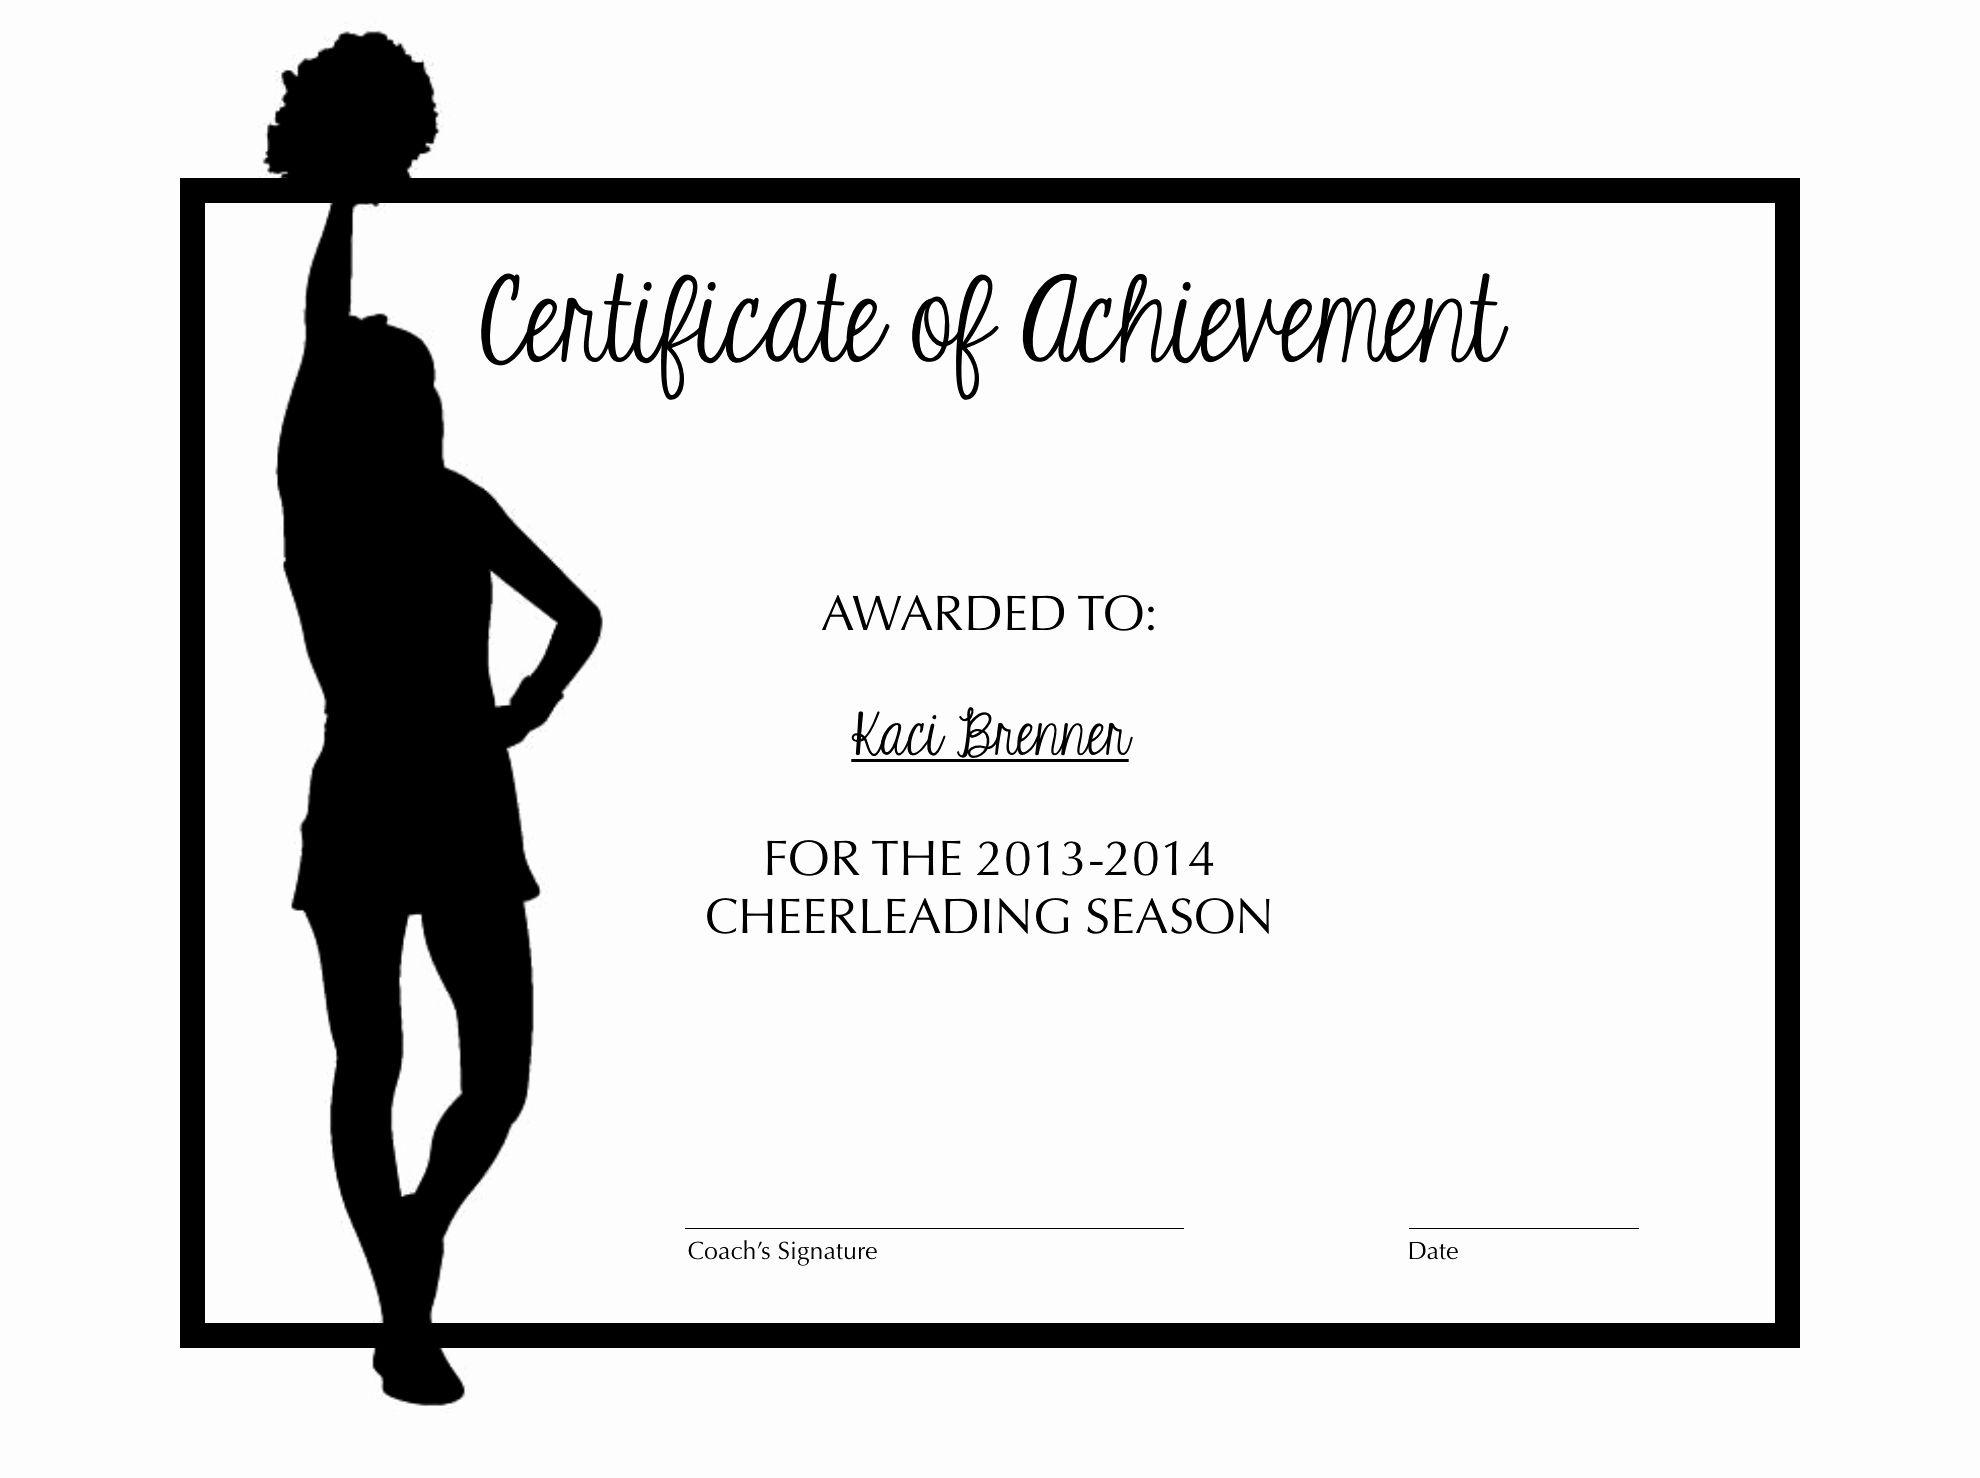 Free Cheer Award Certificate Templates Beautiful Cheerleading Certificate Of Achievement Cheer Life Coach Quotes Cheer Award Cheerleading Award